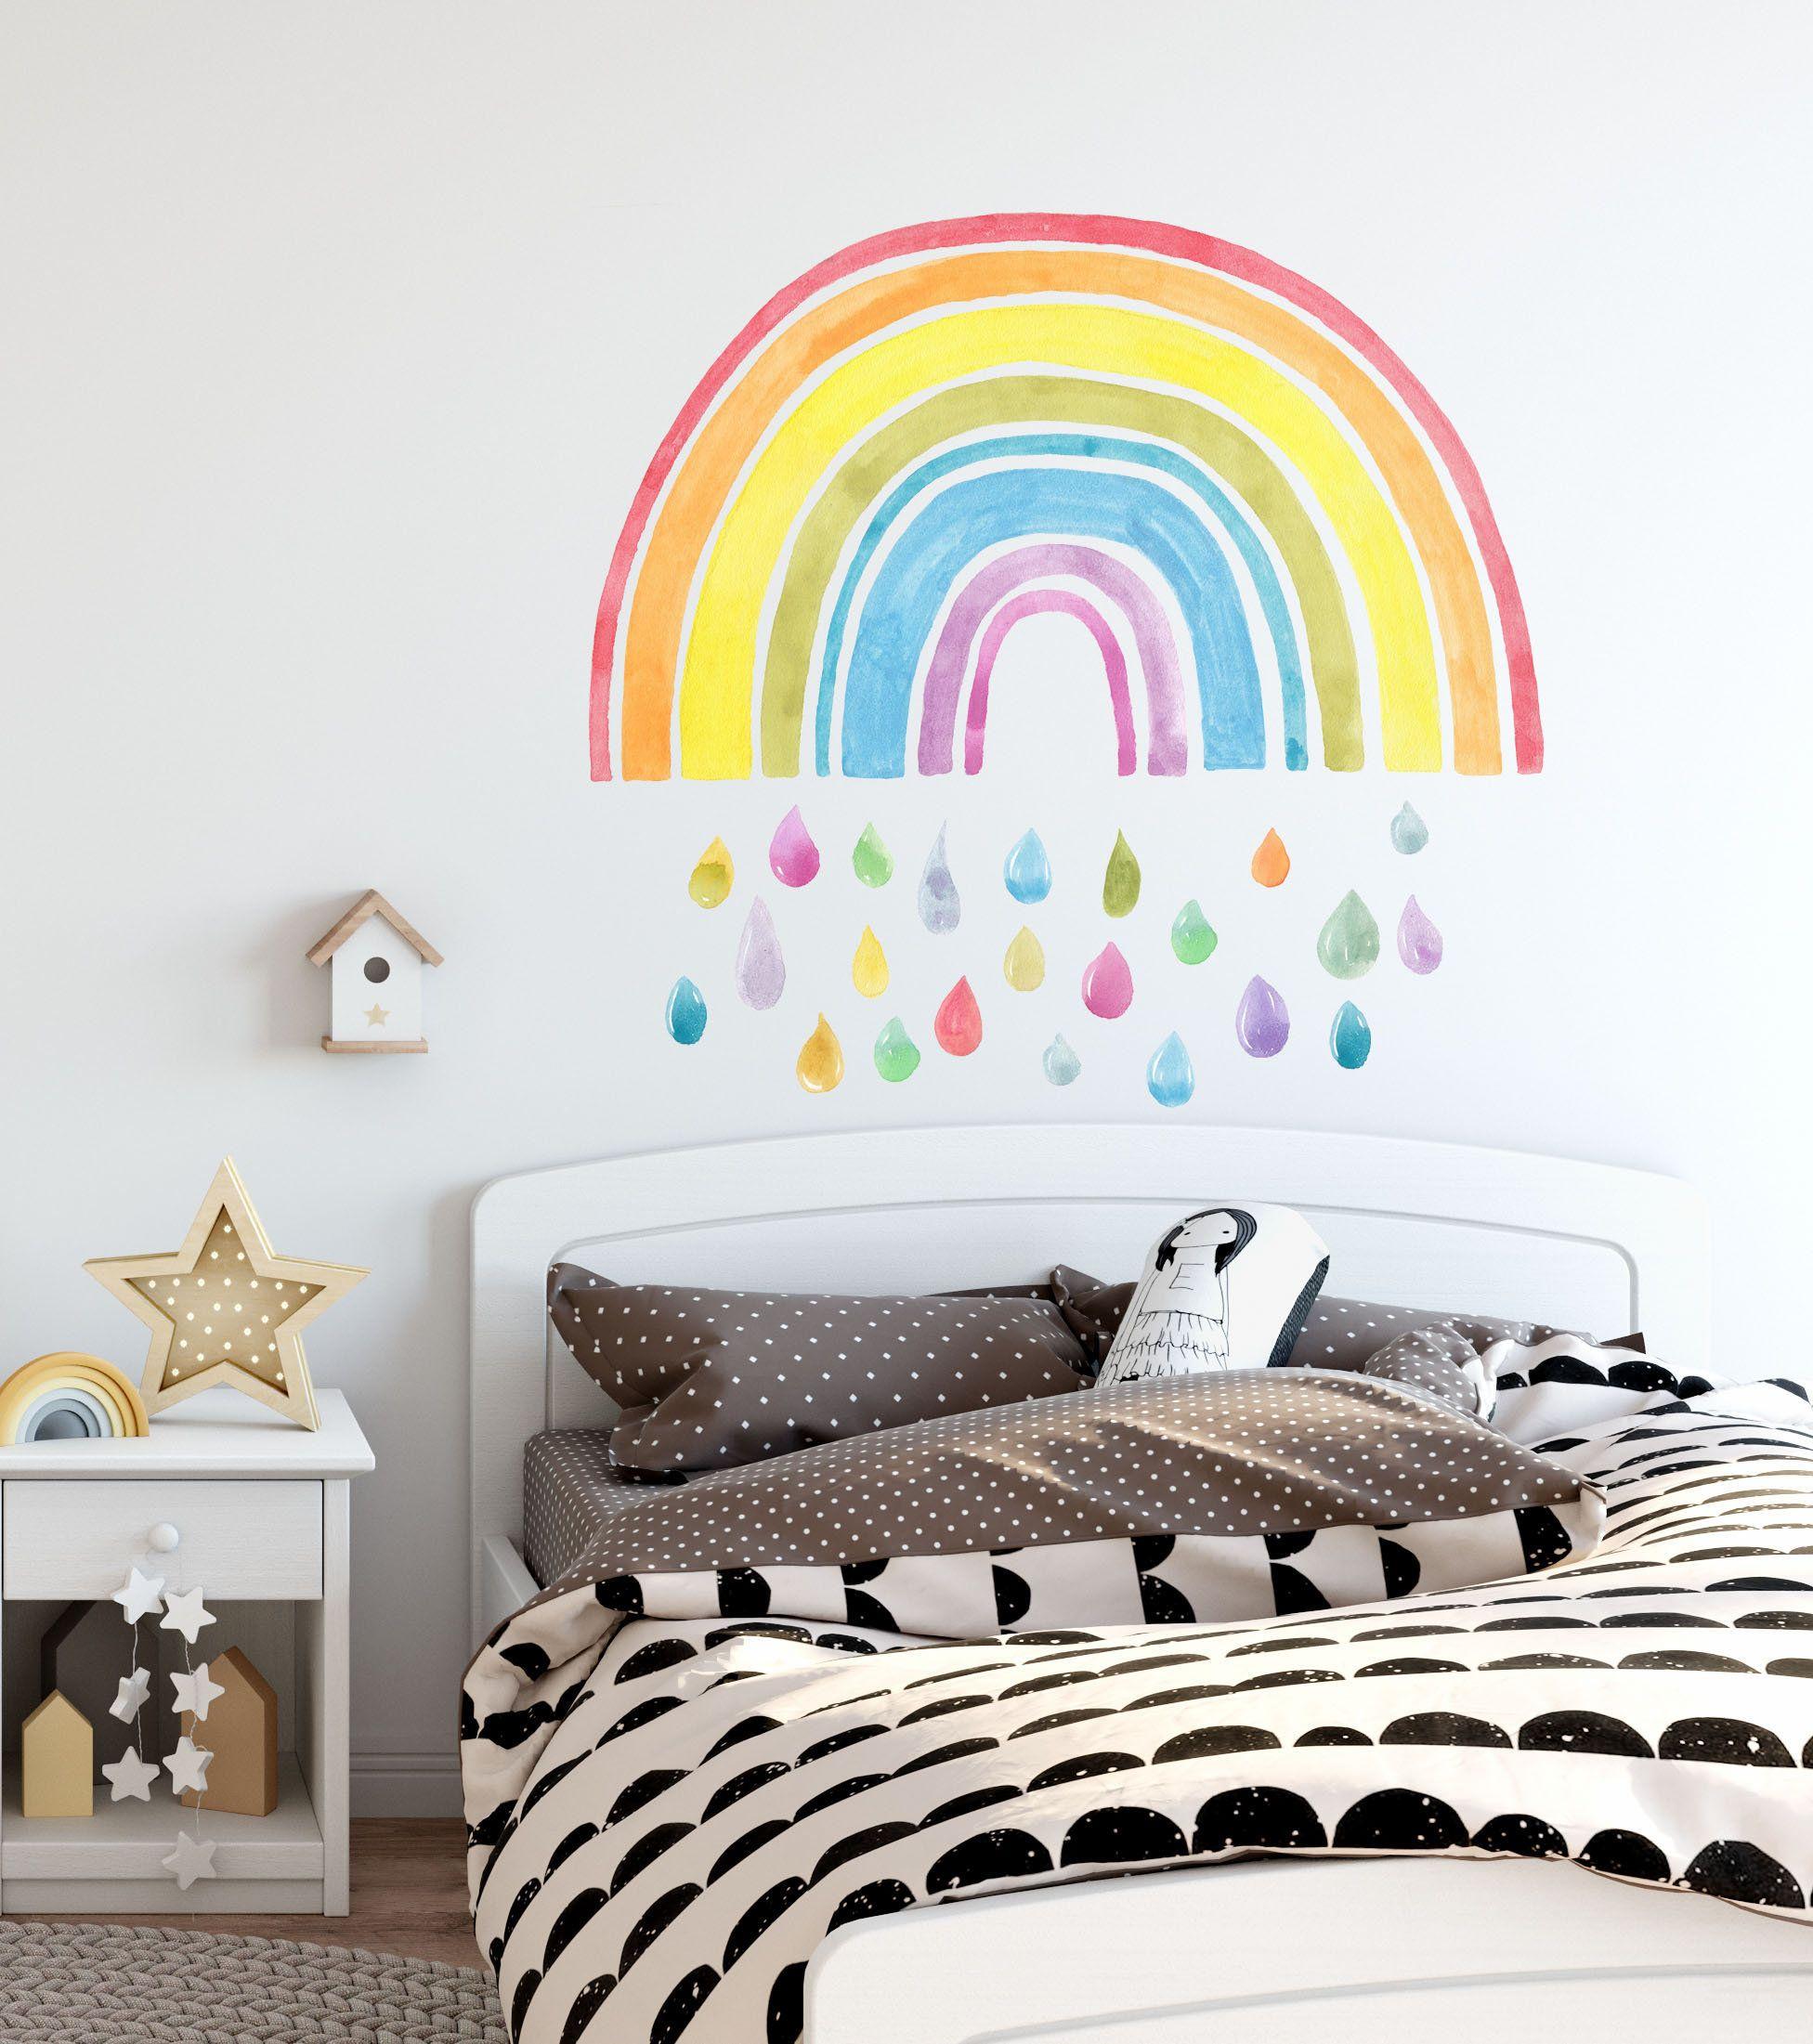 Rainbow Wall Decals Rainbow Wall Decor Rainbow Wall Sticker Etsy Rainbow Wall Decor Rainbow Wall Decal Rainbow Wall Stickers